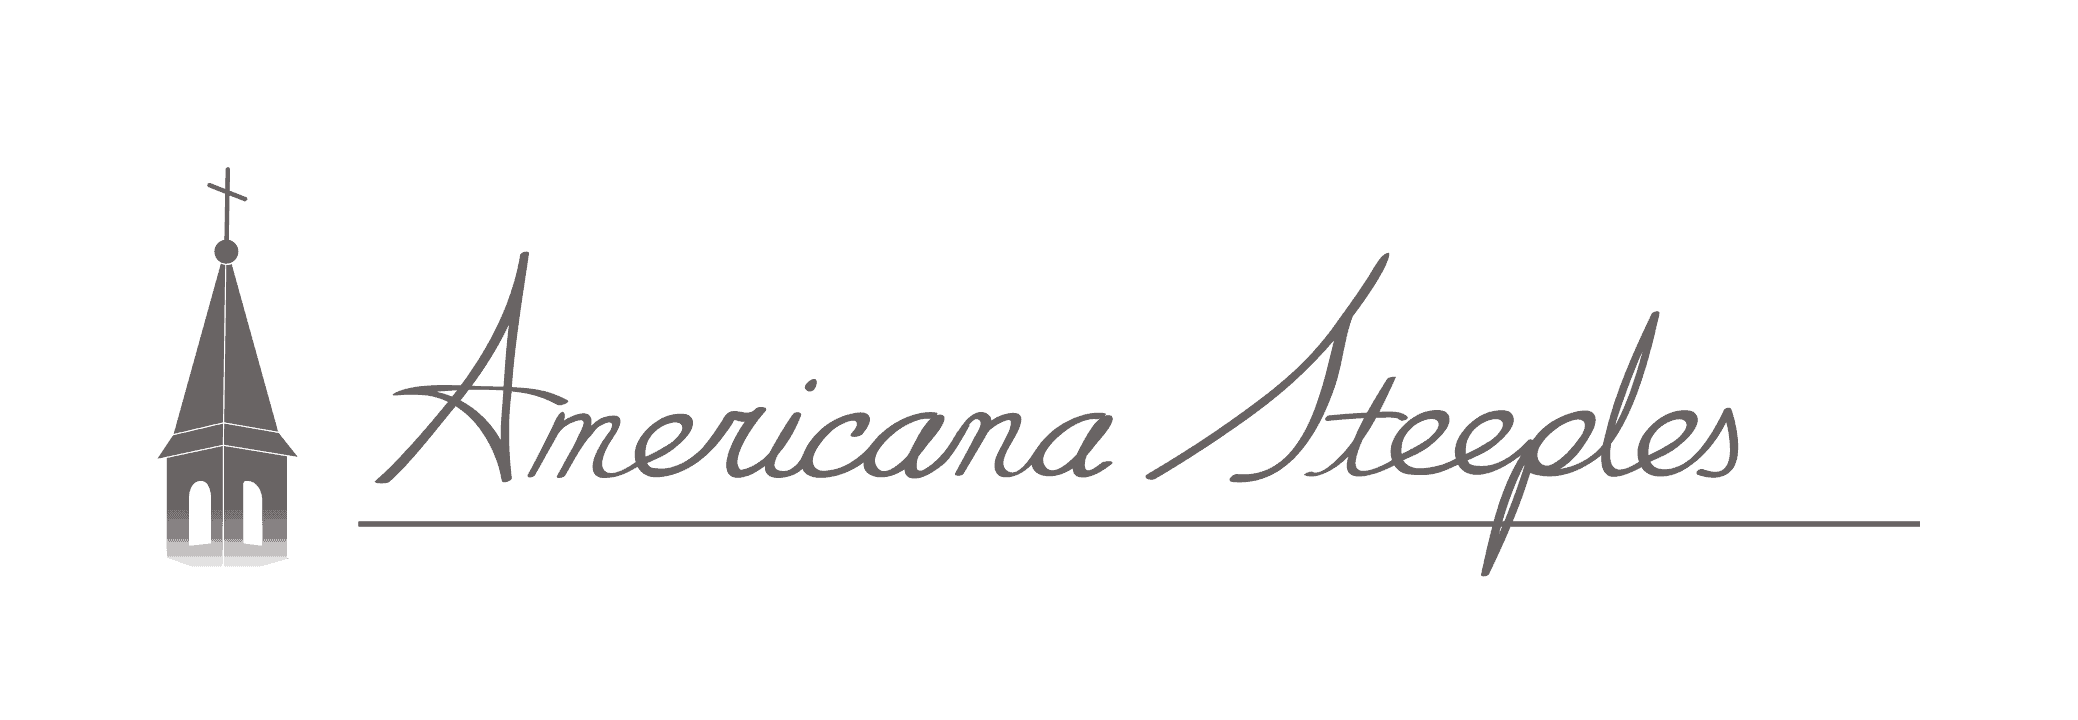 Americana Steeples